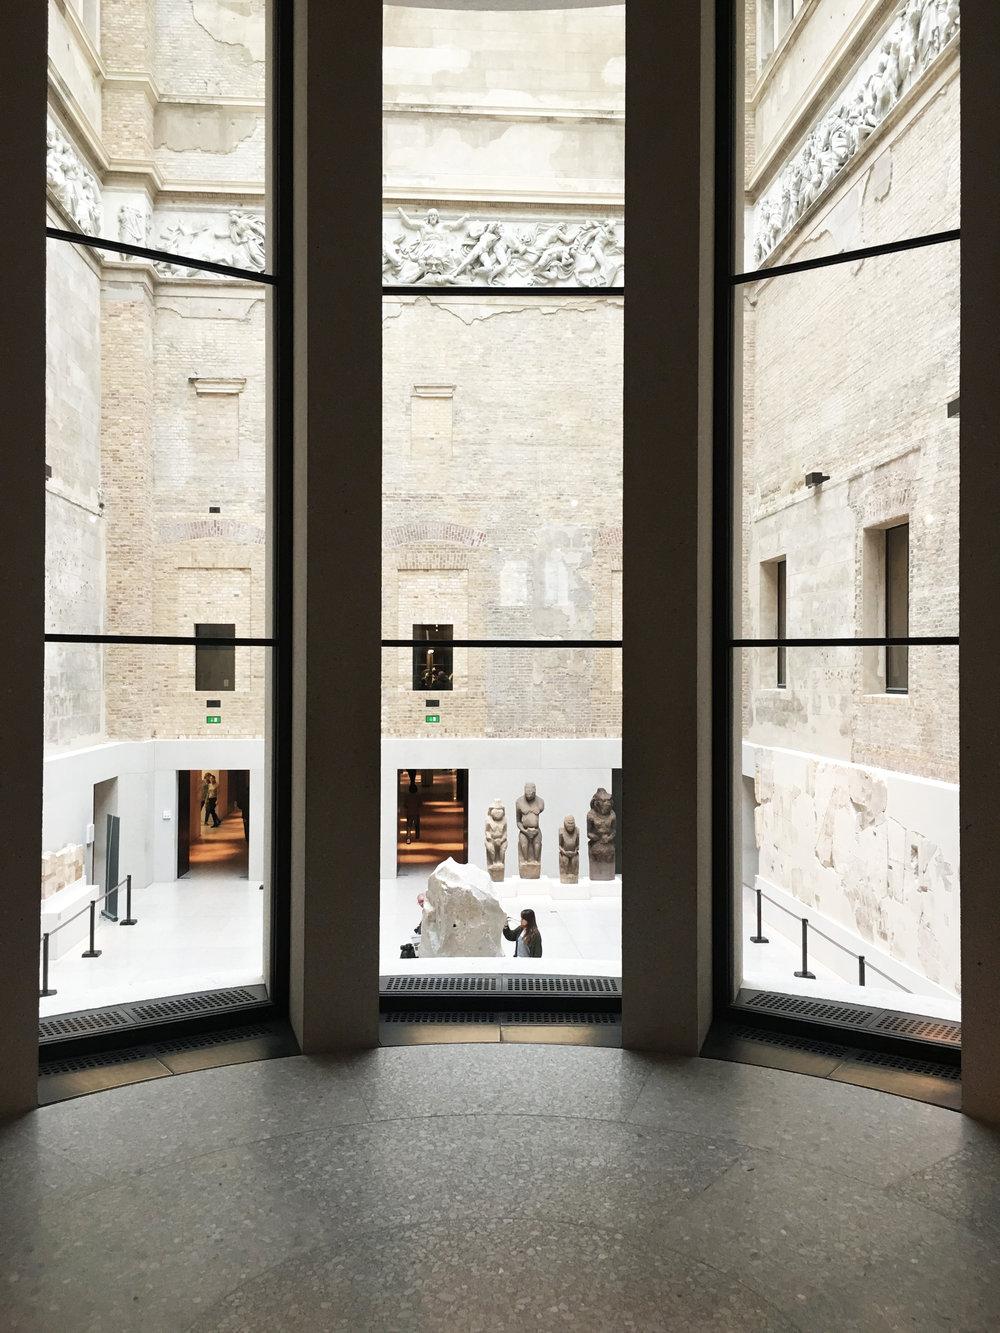 Lozidaze_Neues-Museum_09